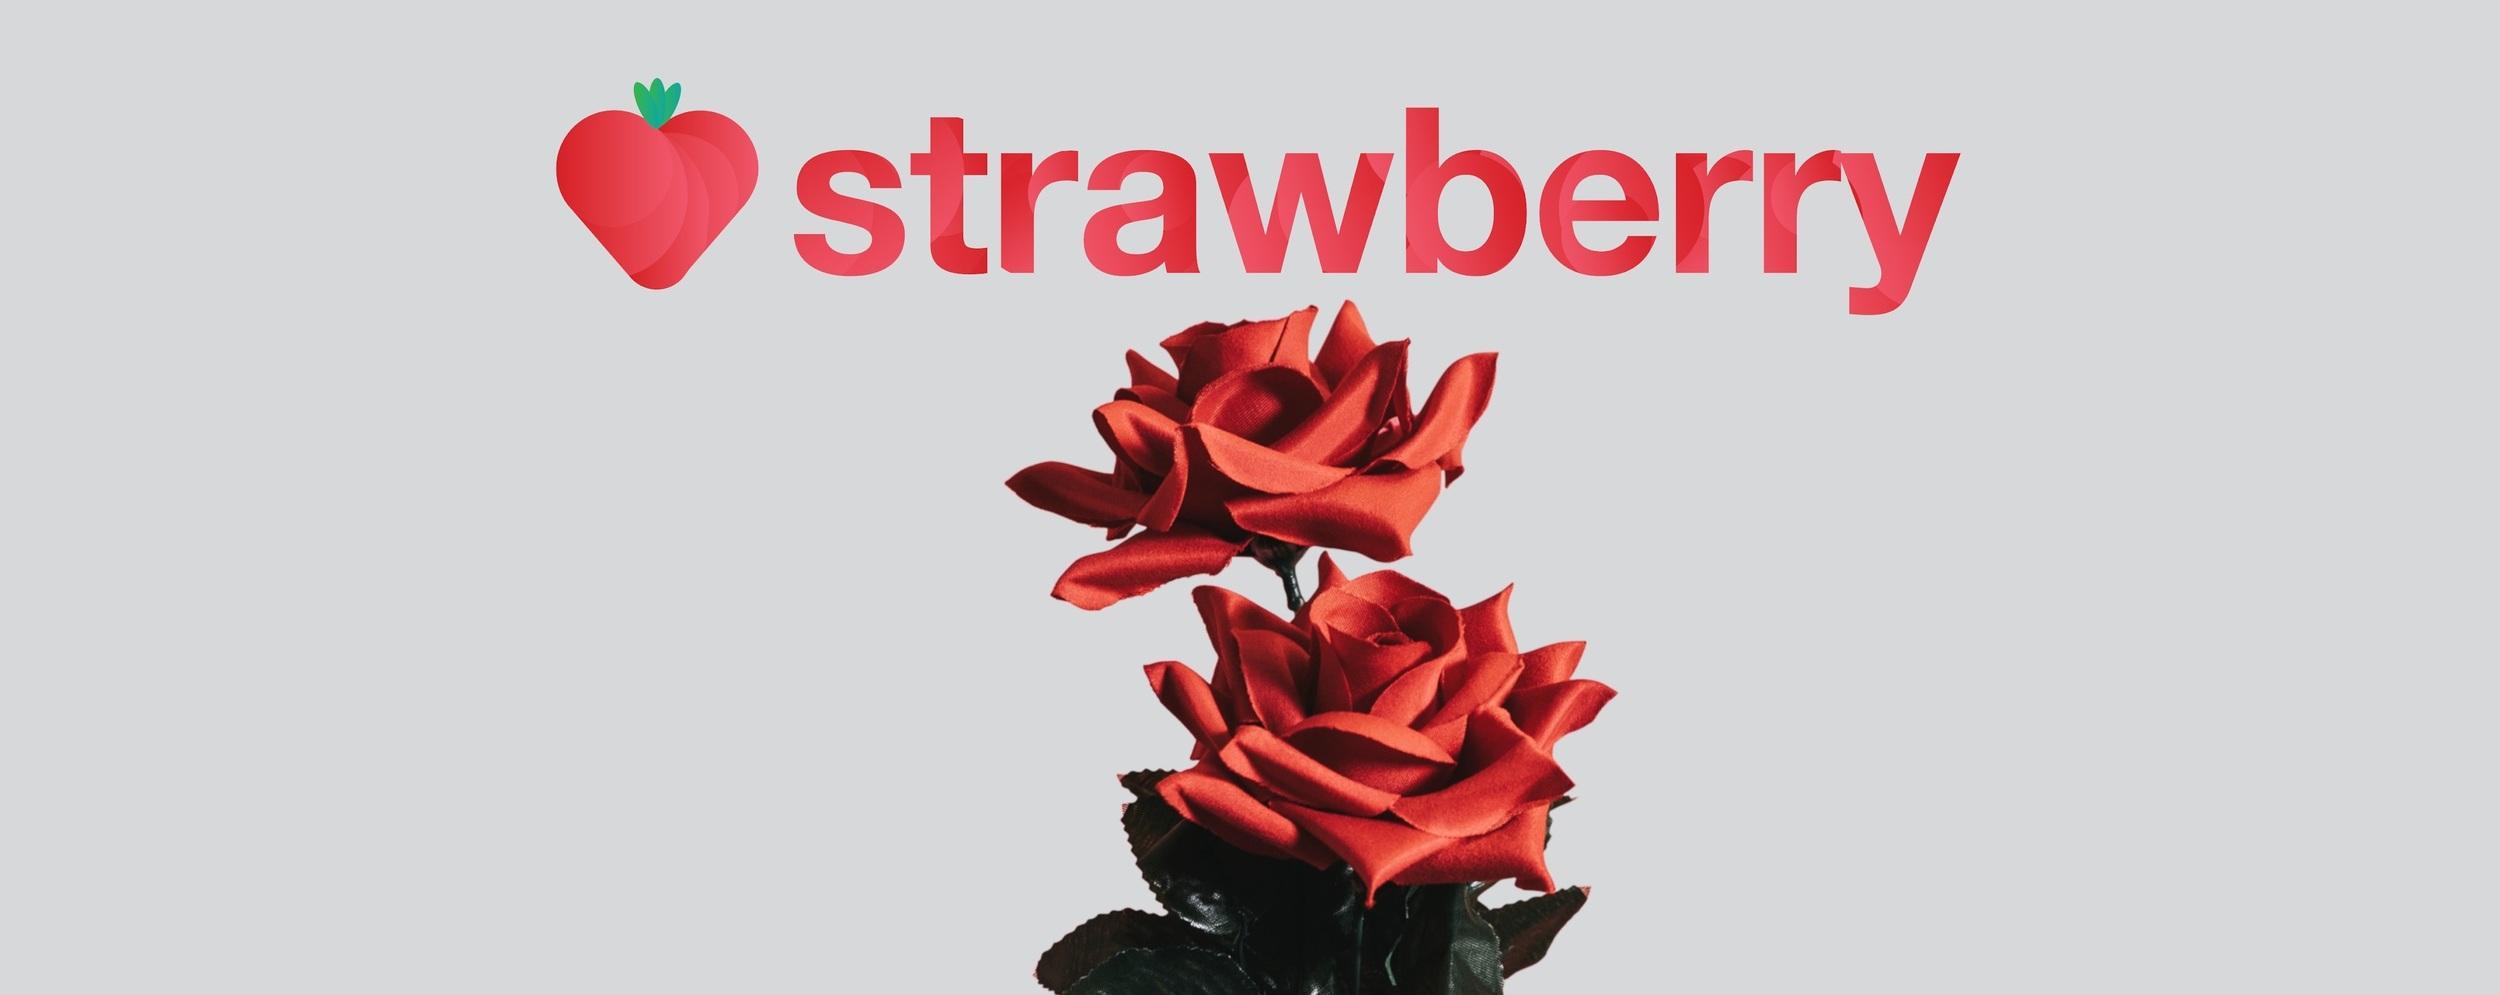 strawbs%2Bflower.jpg